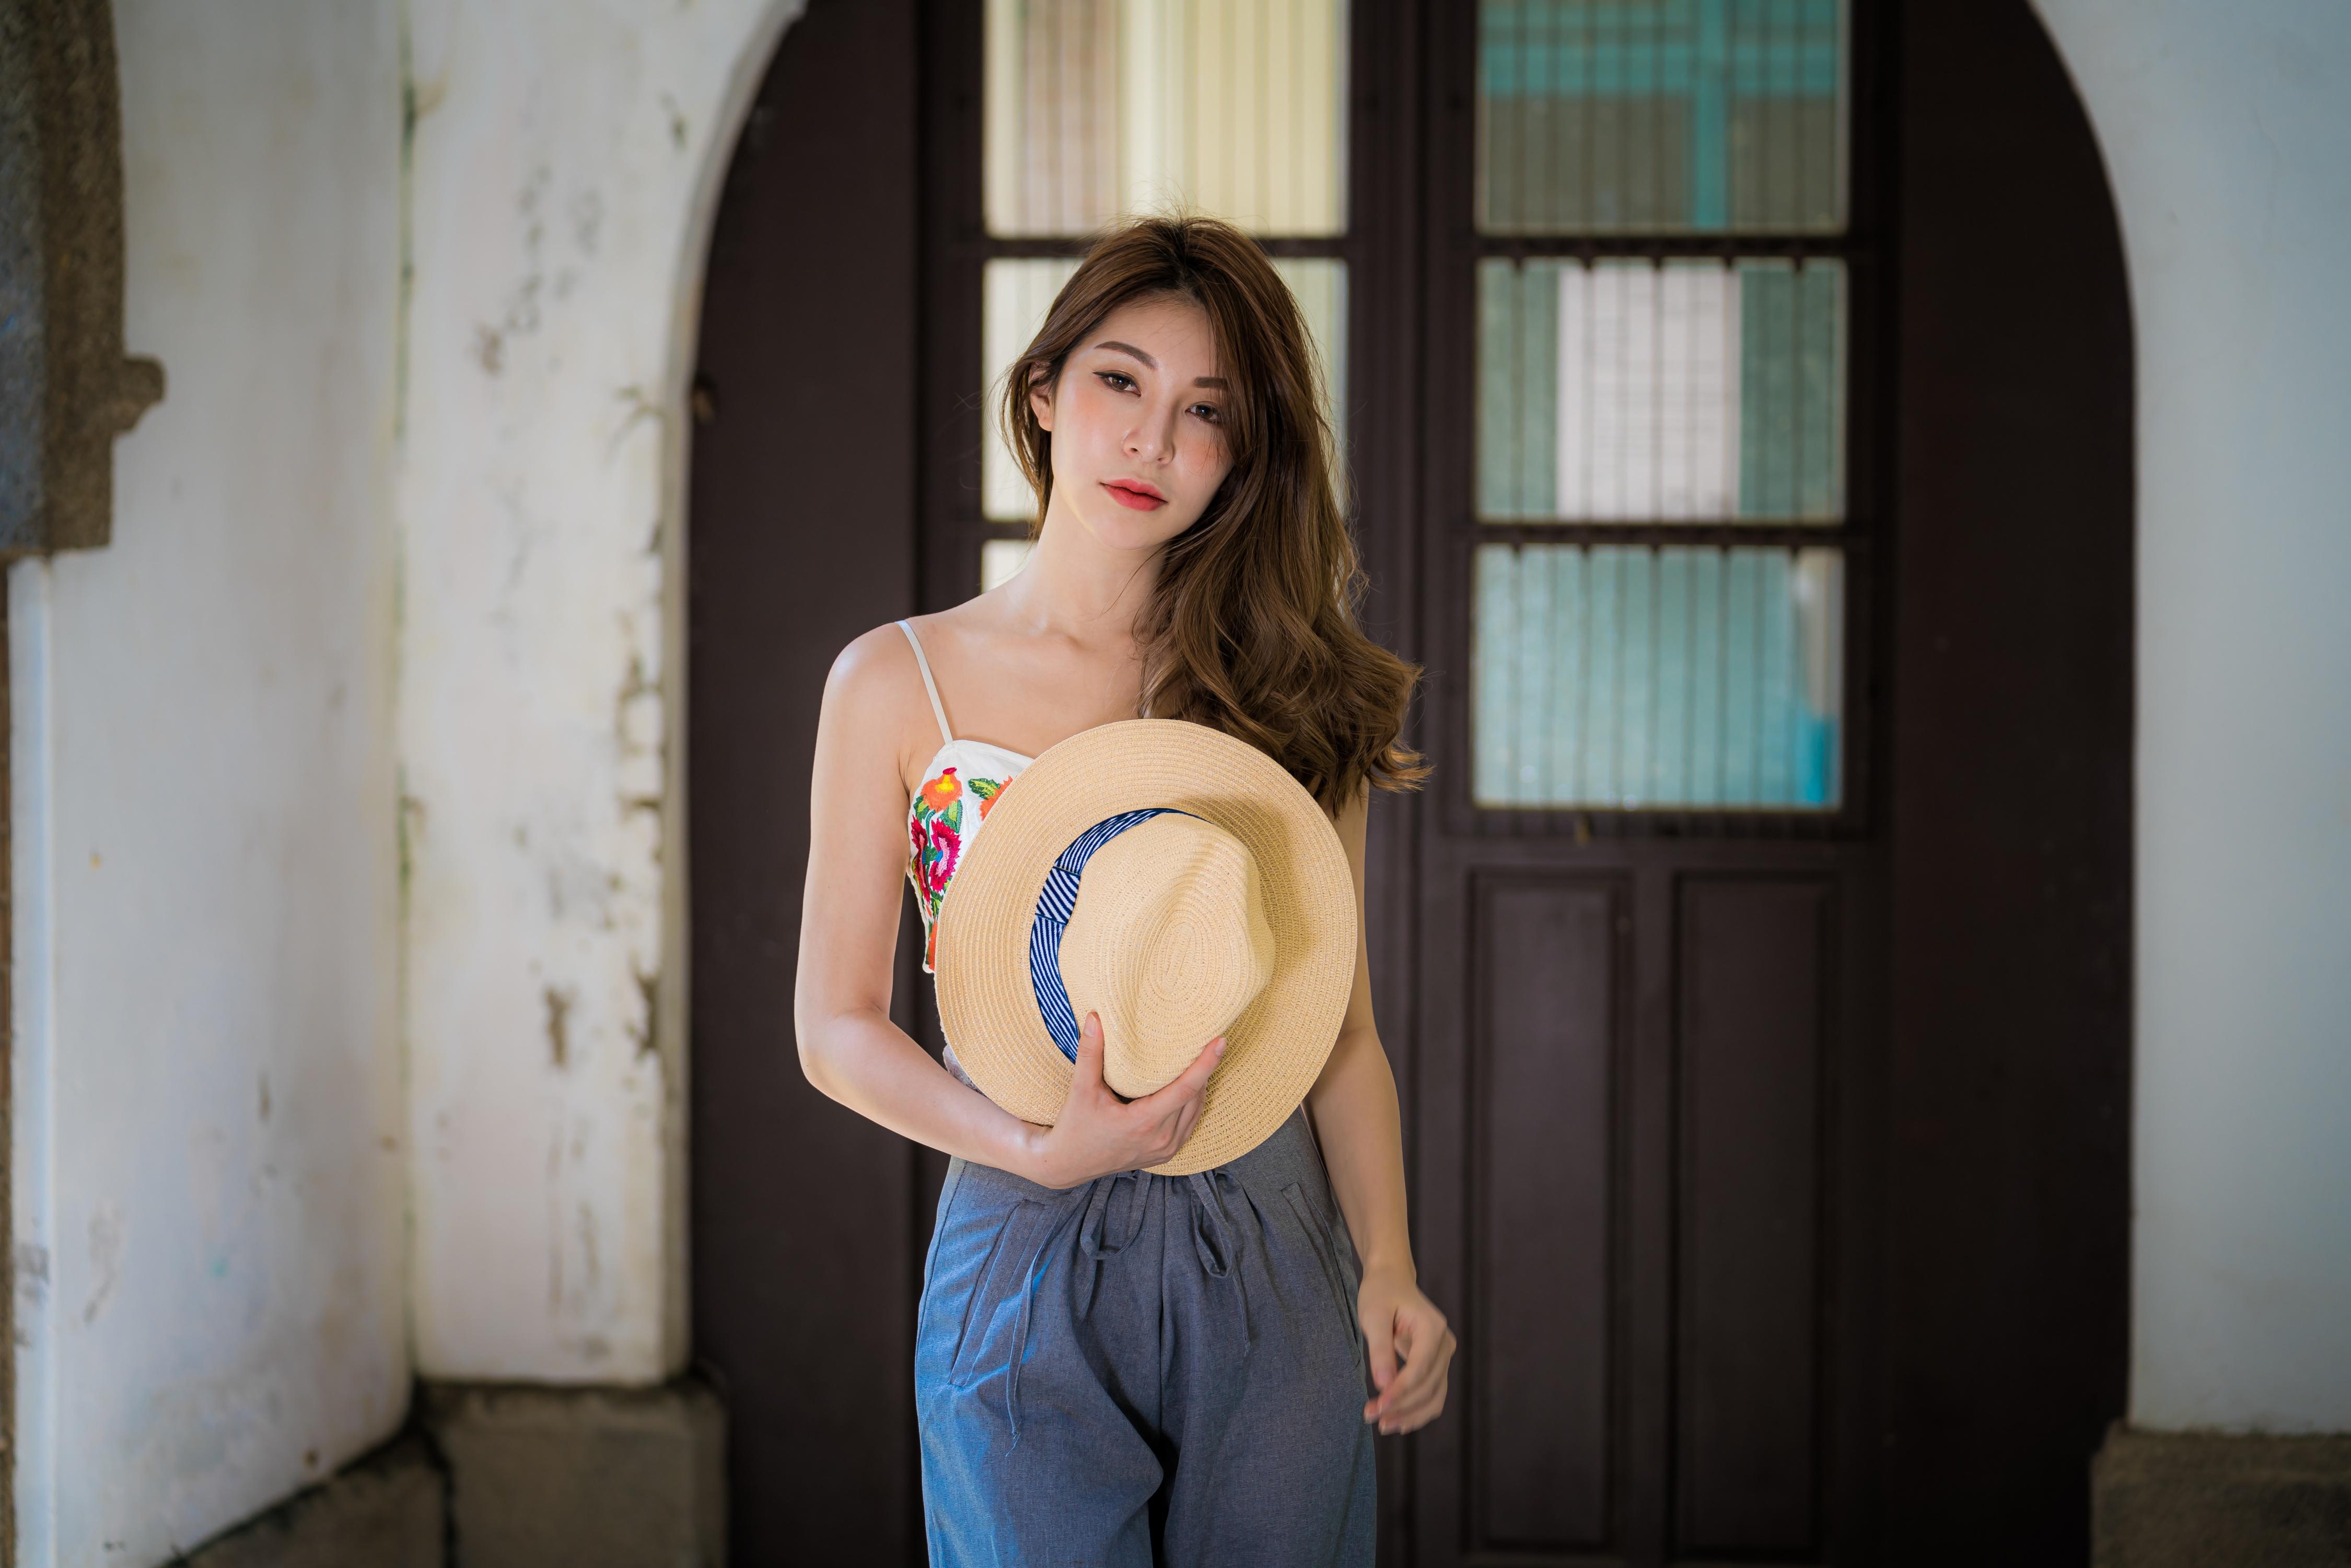 Asian Brunette Girl Hat Lipstick Model Woman 4500x3002